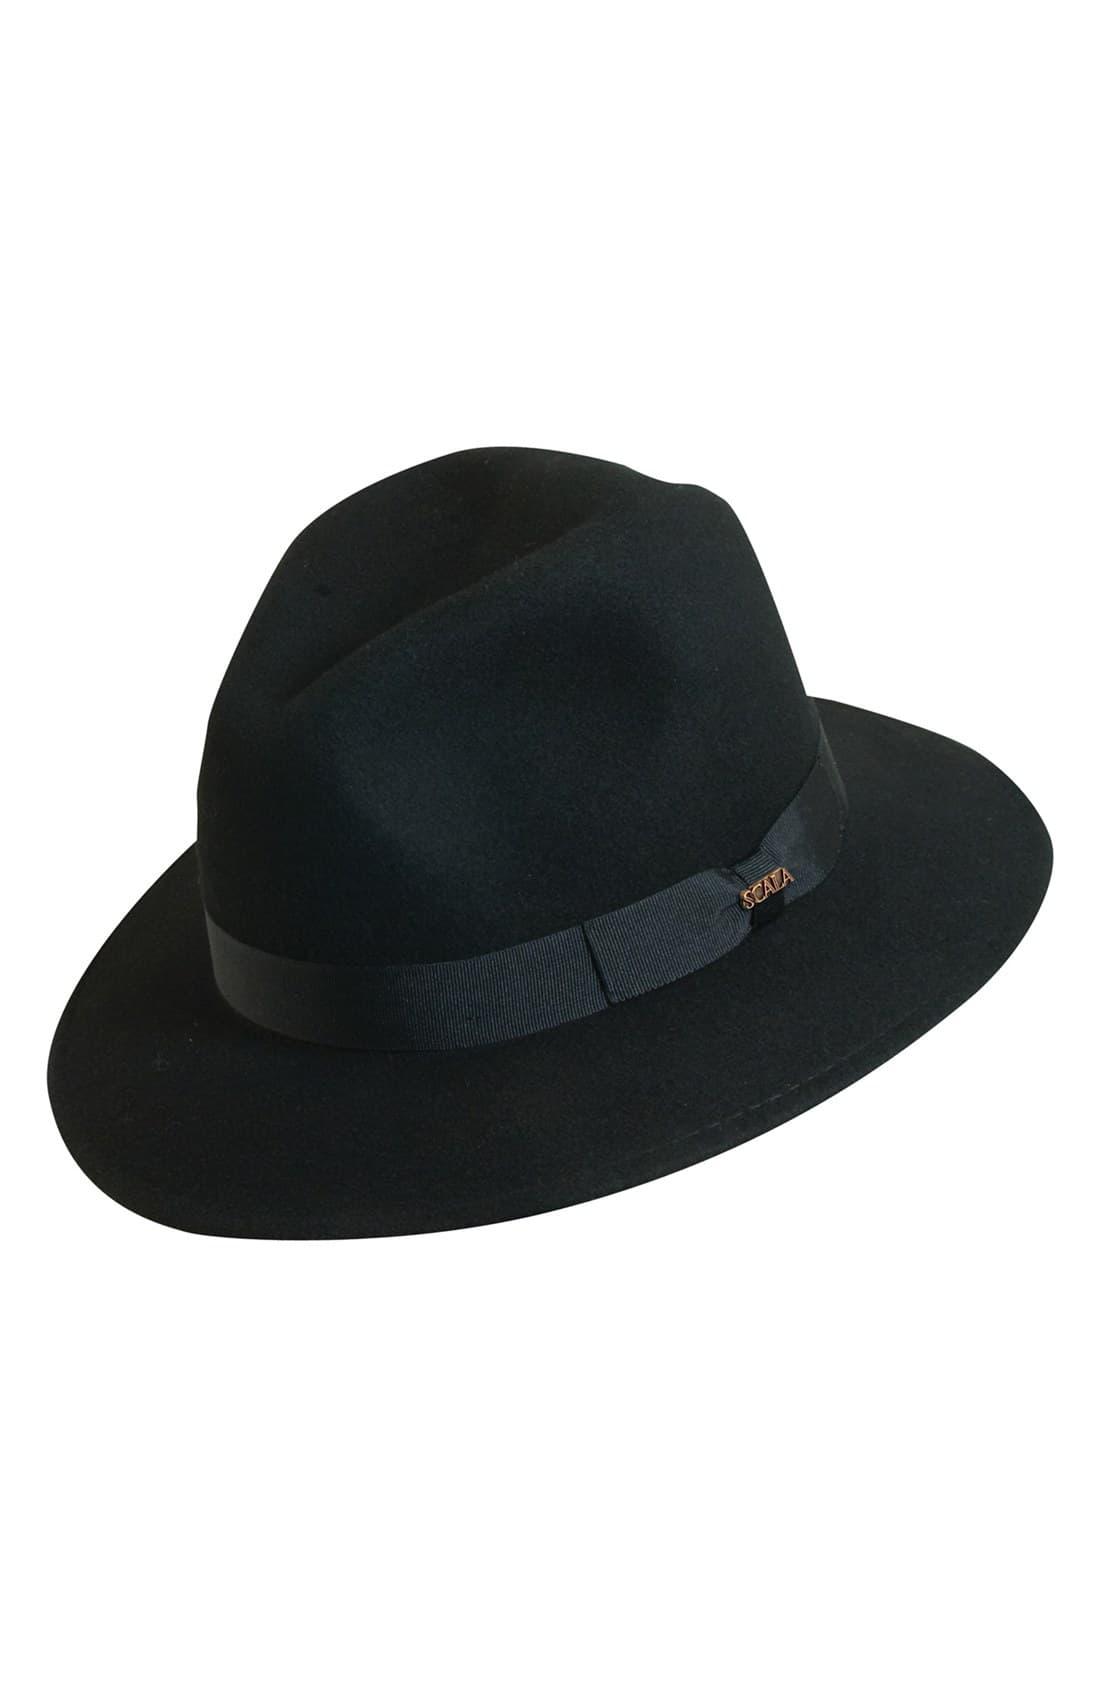 59afa8b55a5fe7 Men's Scala 'Classico' Crushable Felt Safari Hat - Black in 2019 ...